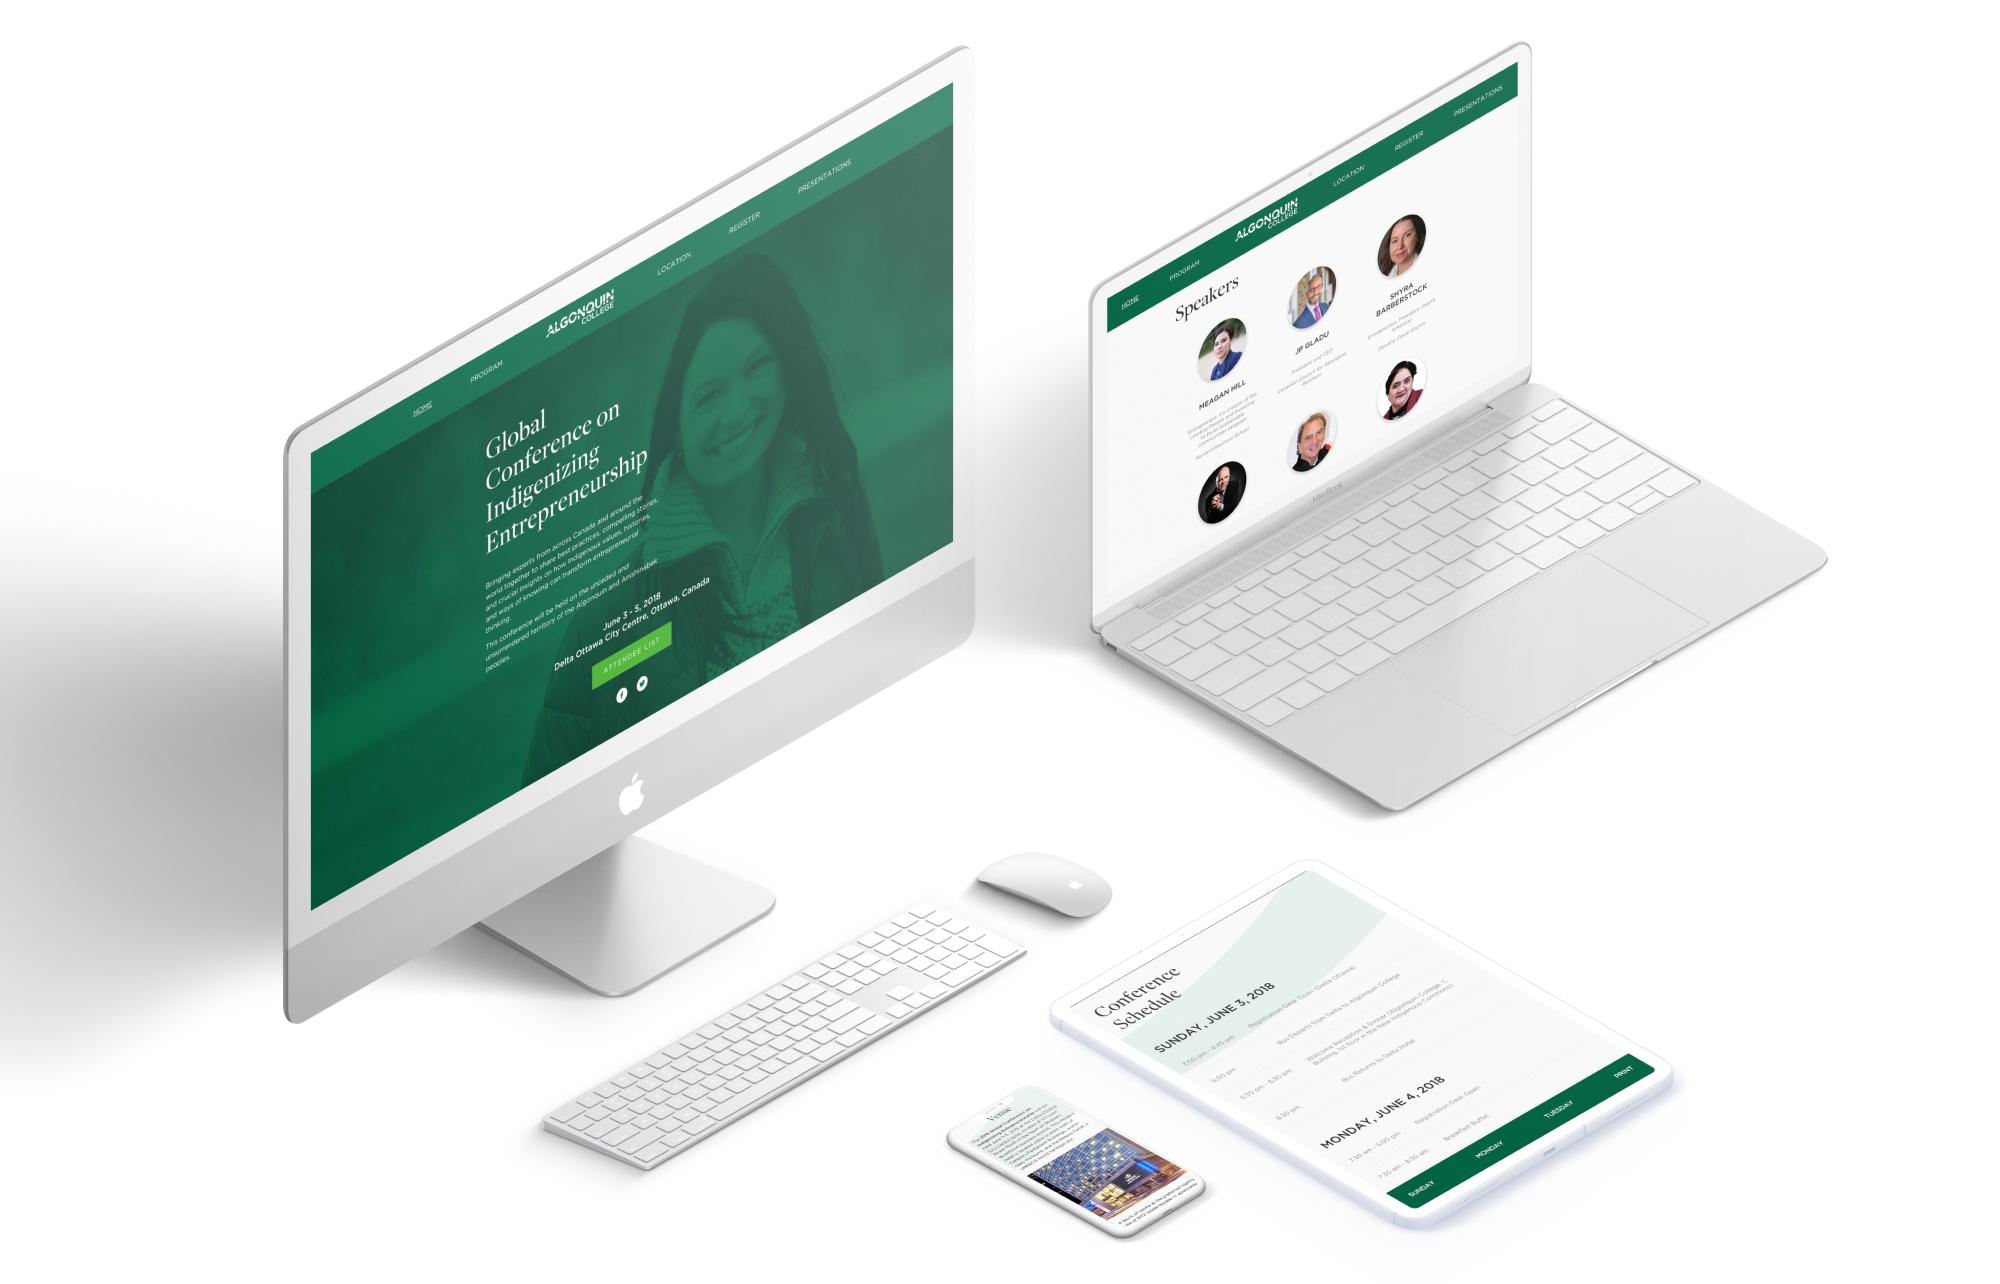 A variety of digital screens showcasing the GCIE website